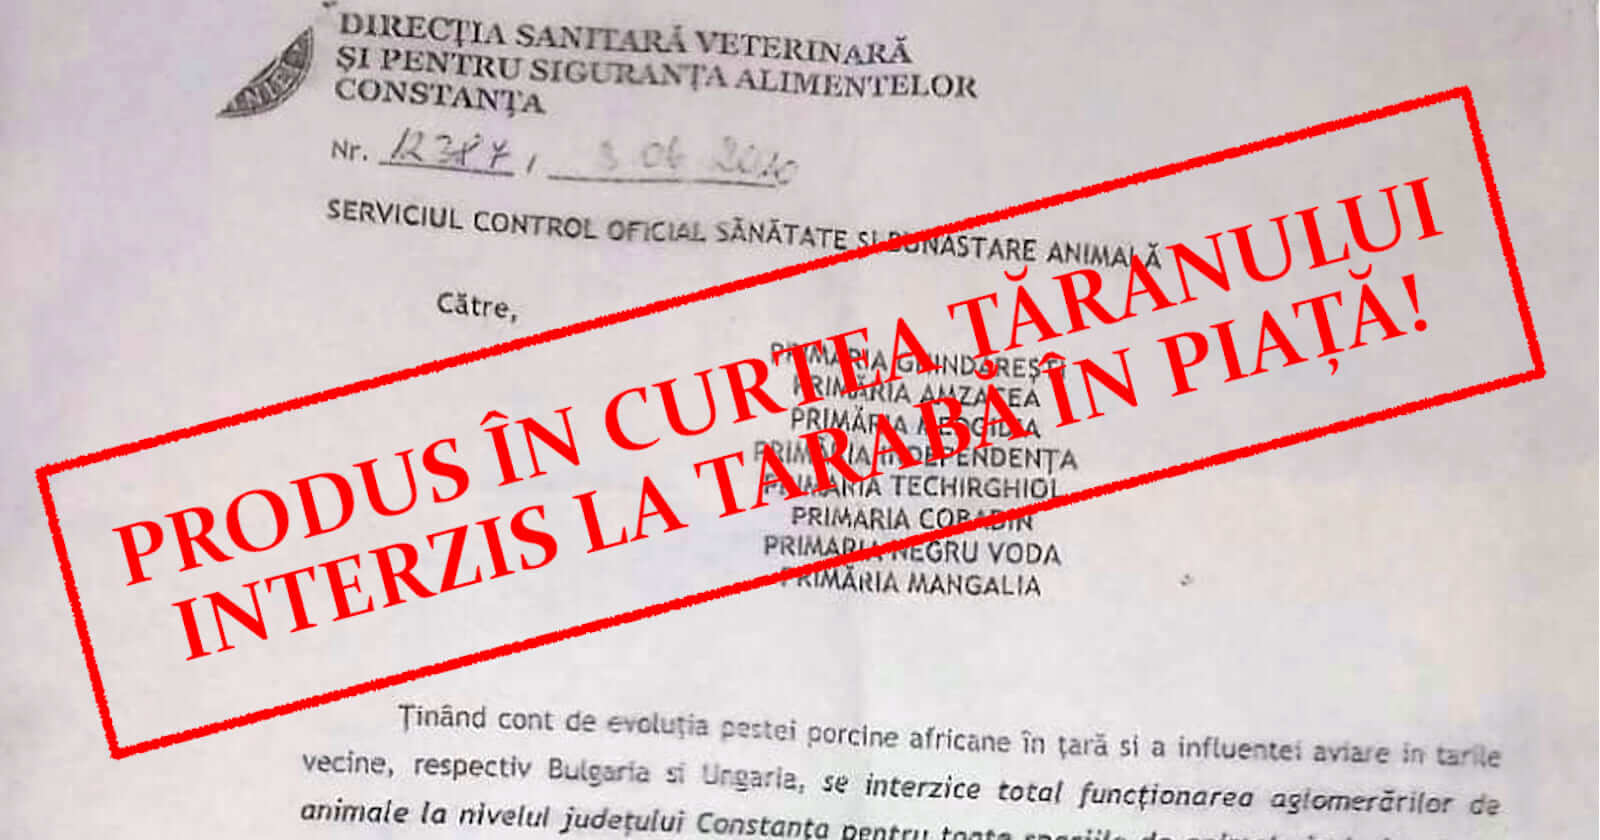 https://ziarul.romania-rationala.ro/control/articole/articole/sa-ucidem-taranul-in-mod-legal.jpg